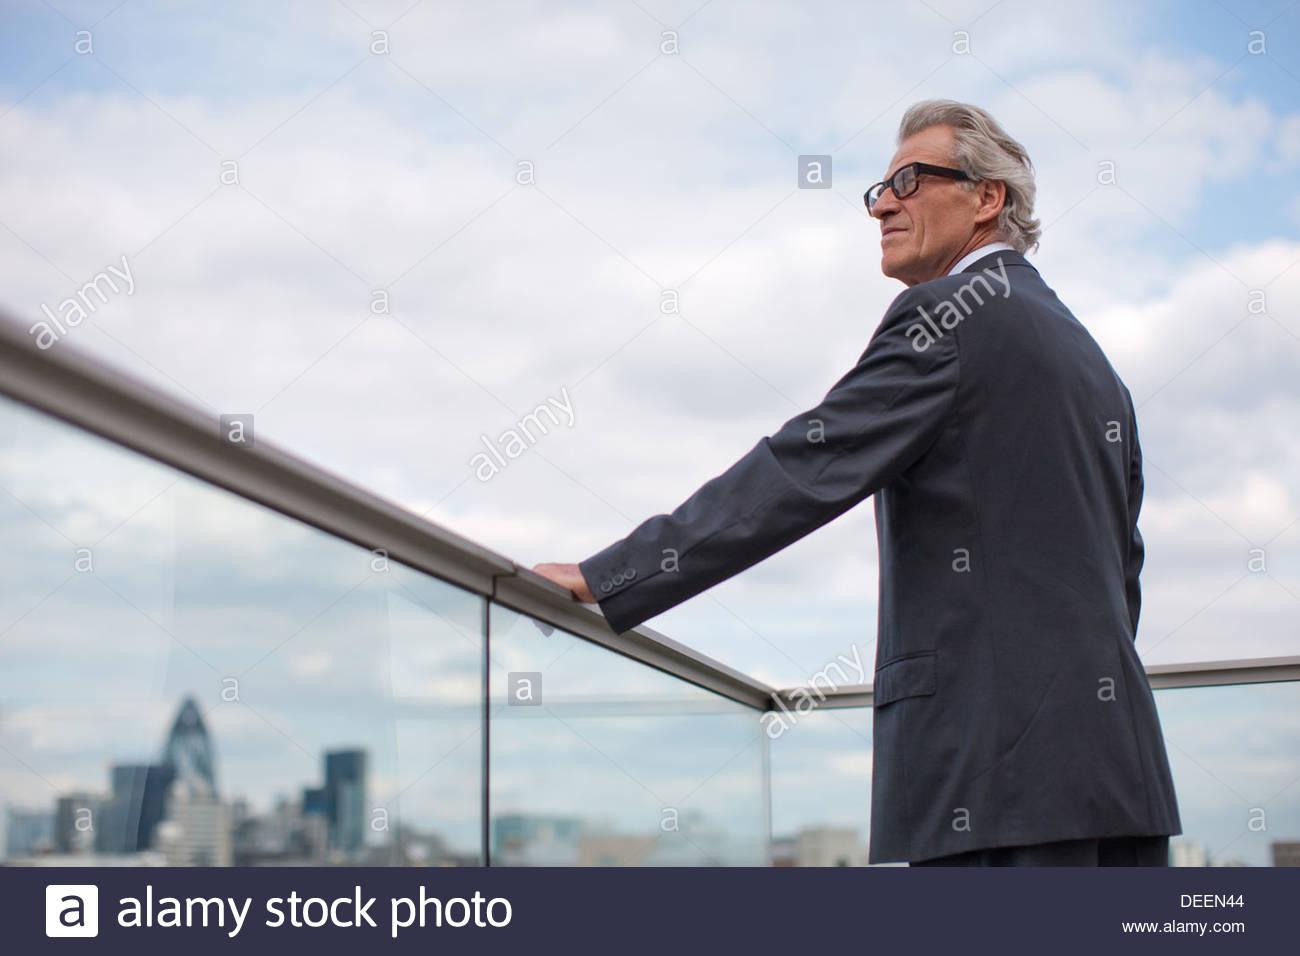 Businessman standing on balcony railing - Stock Image